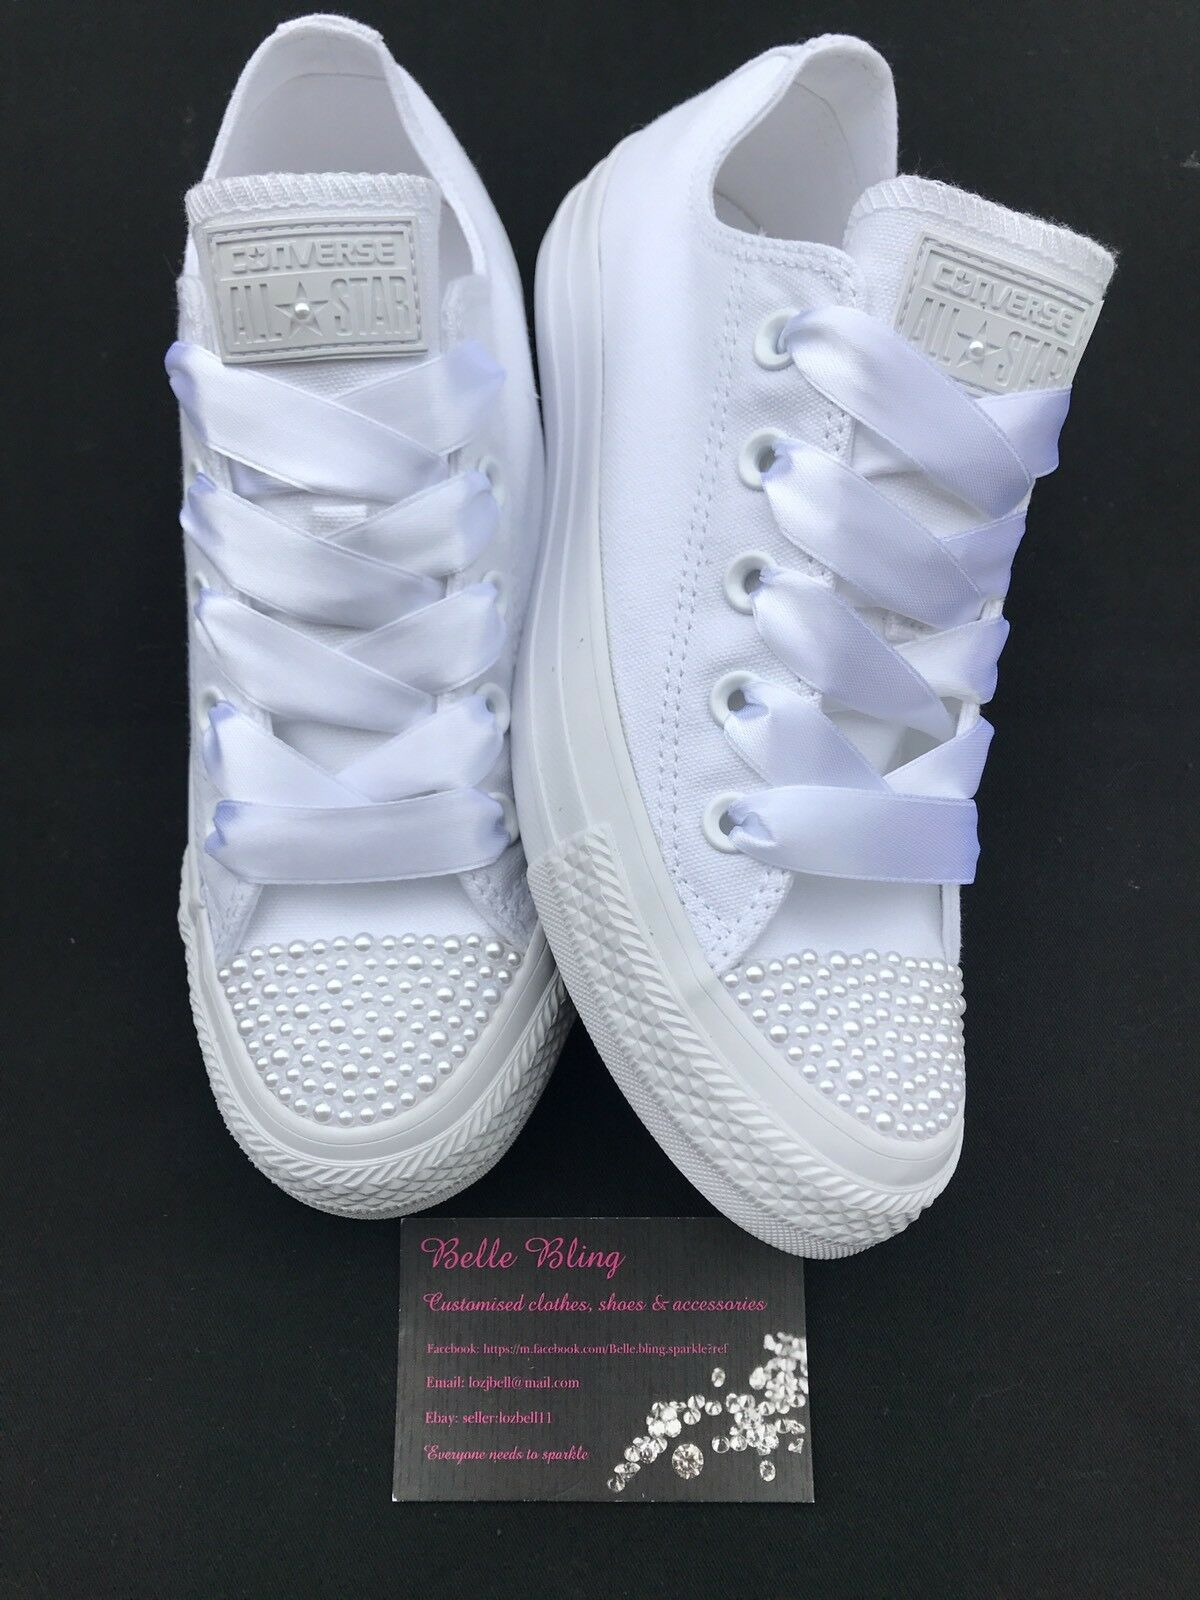 new product c6b50 990d9 Robe de mariage Converse Baskets mono perles blanches personnalisé 3 3 3 4  5 6 7 8 9 3eedae